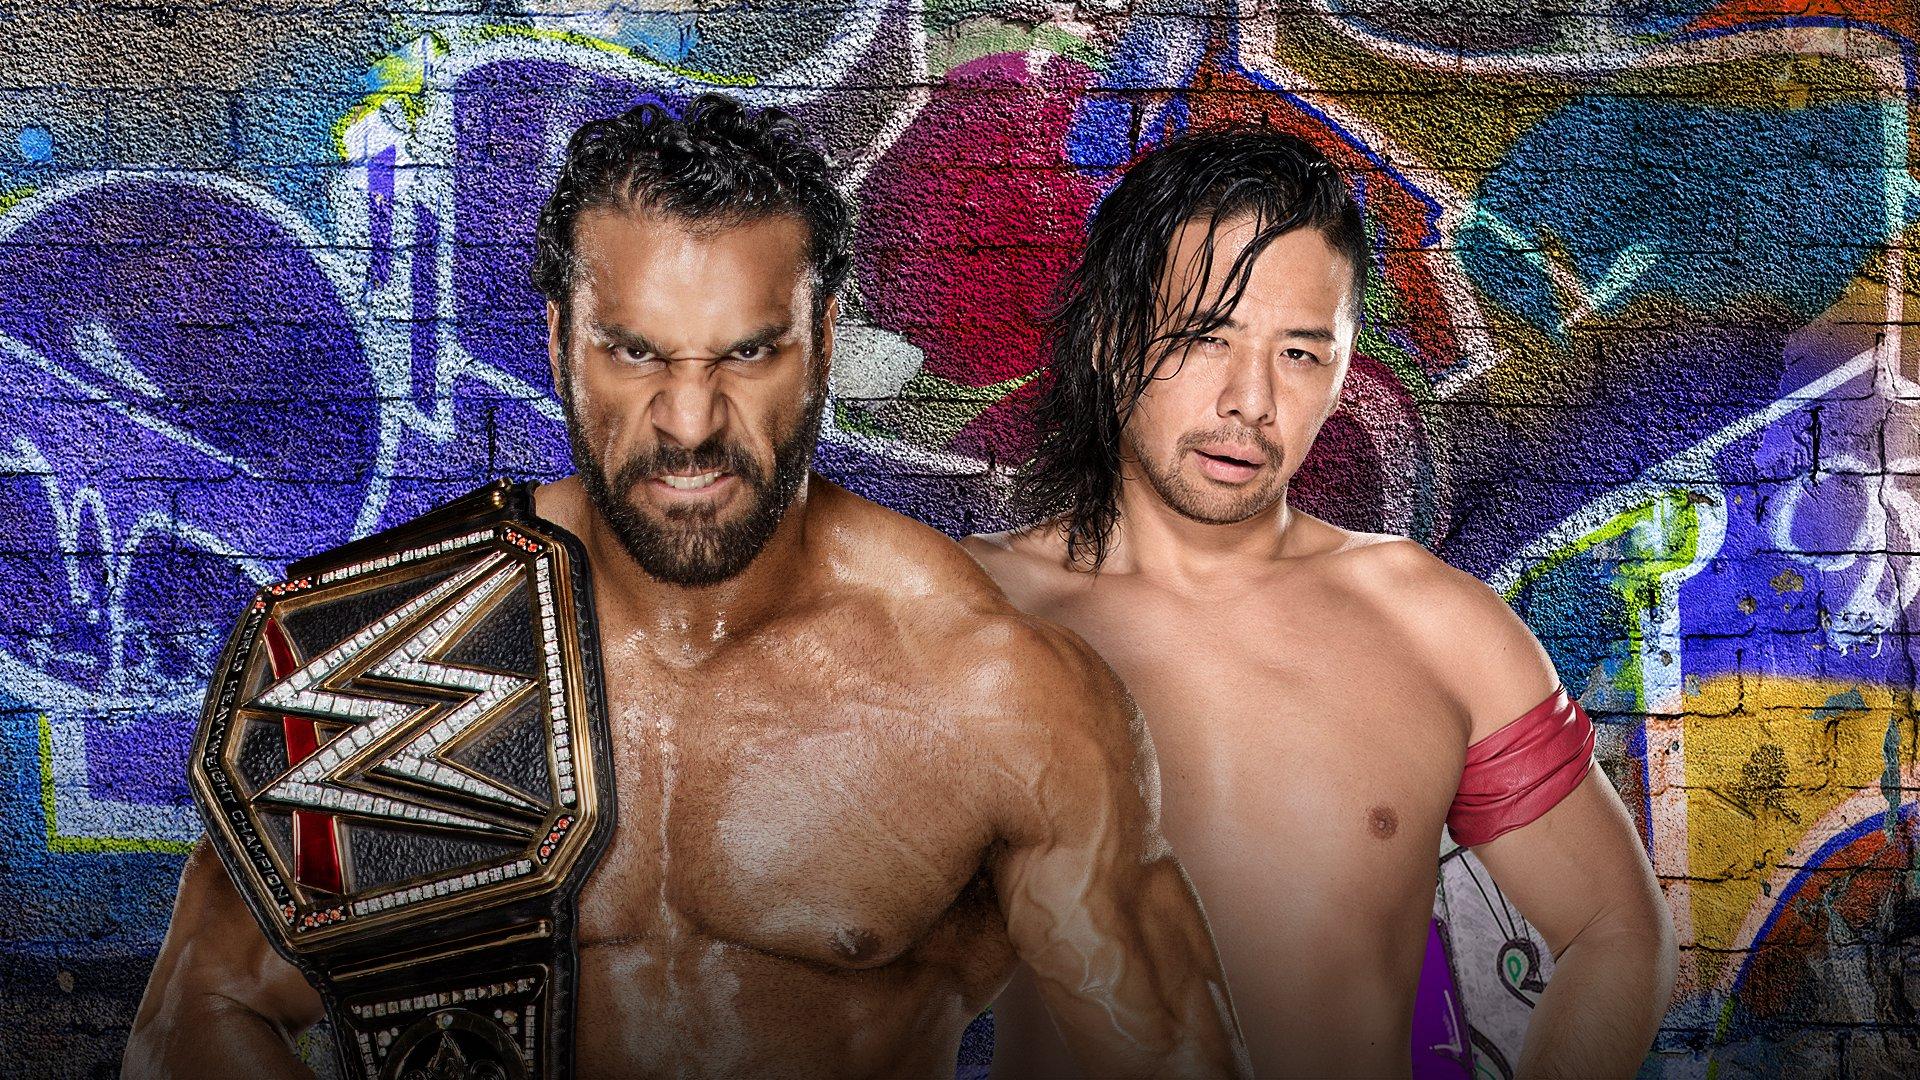 WWE SummerSlam 2017: Jinder Mahal vs. Shinsuke Nakamura